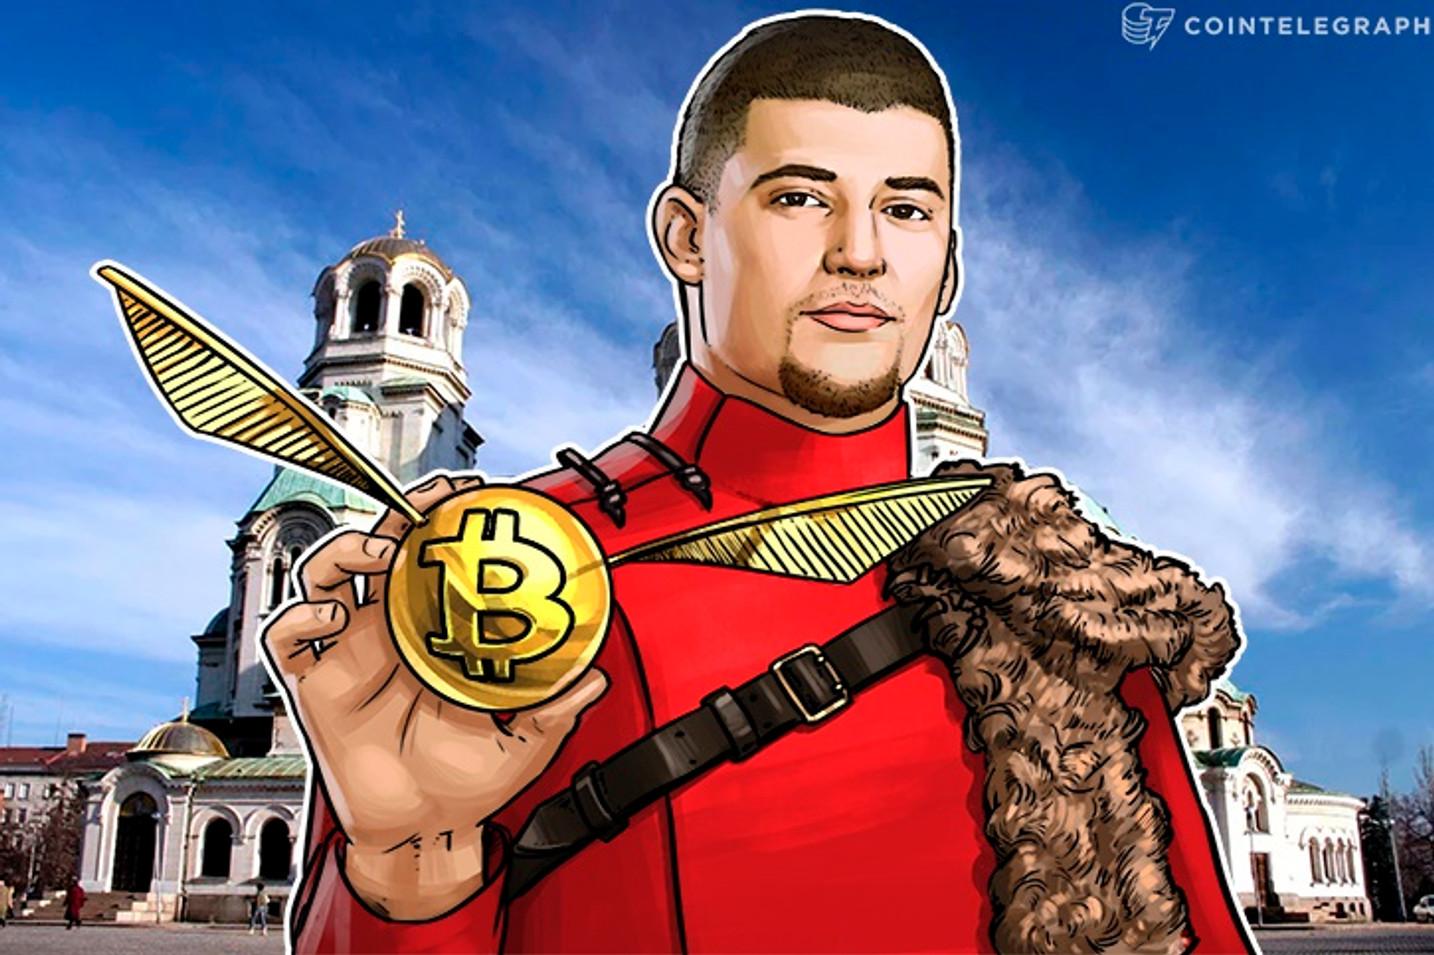 Bulgaria Seizes Enough Bitcoin to Pay Off 1/5 of National Debt